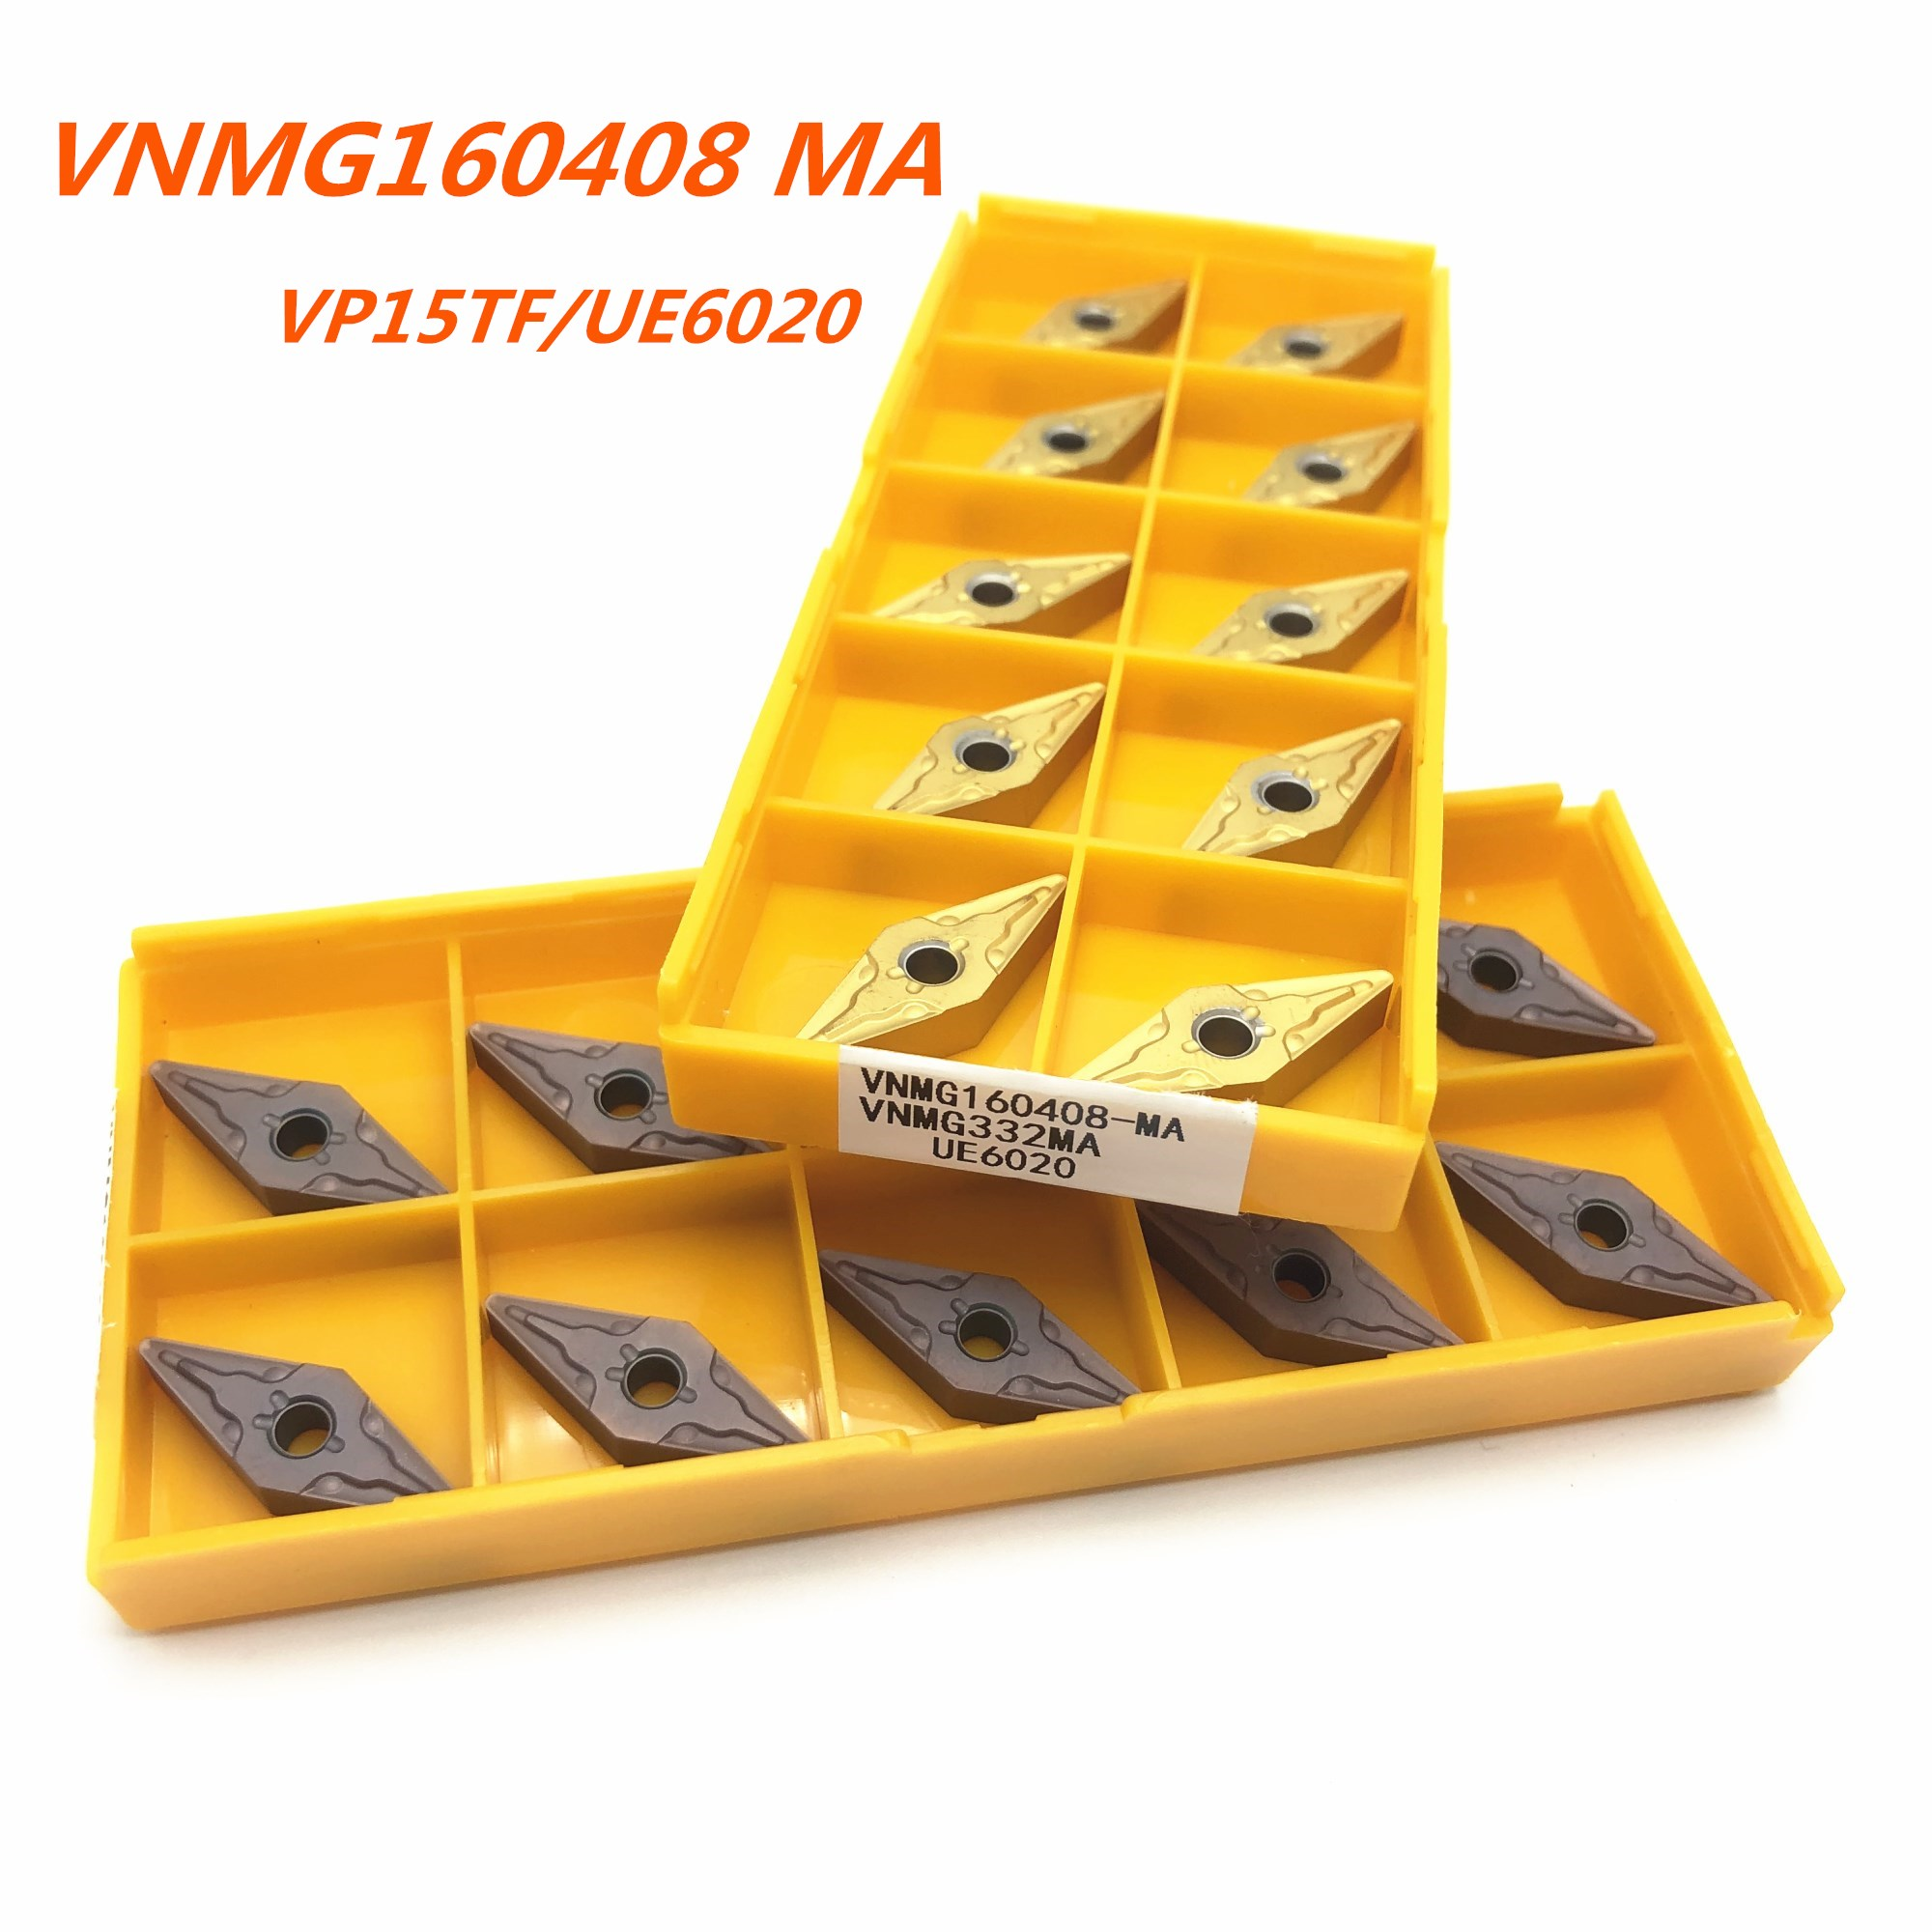 VNMG160408MA VP15TF UE6020 US735 High Quality Carbide Blade Metal Turning Tool CNC Machine Milling Cutter Lathe Tool VNMG 160408